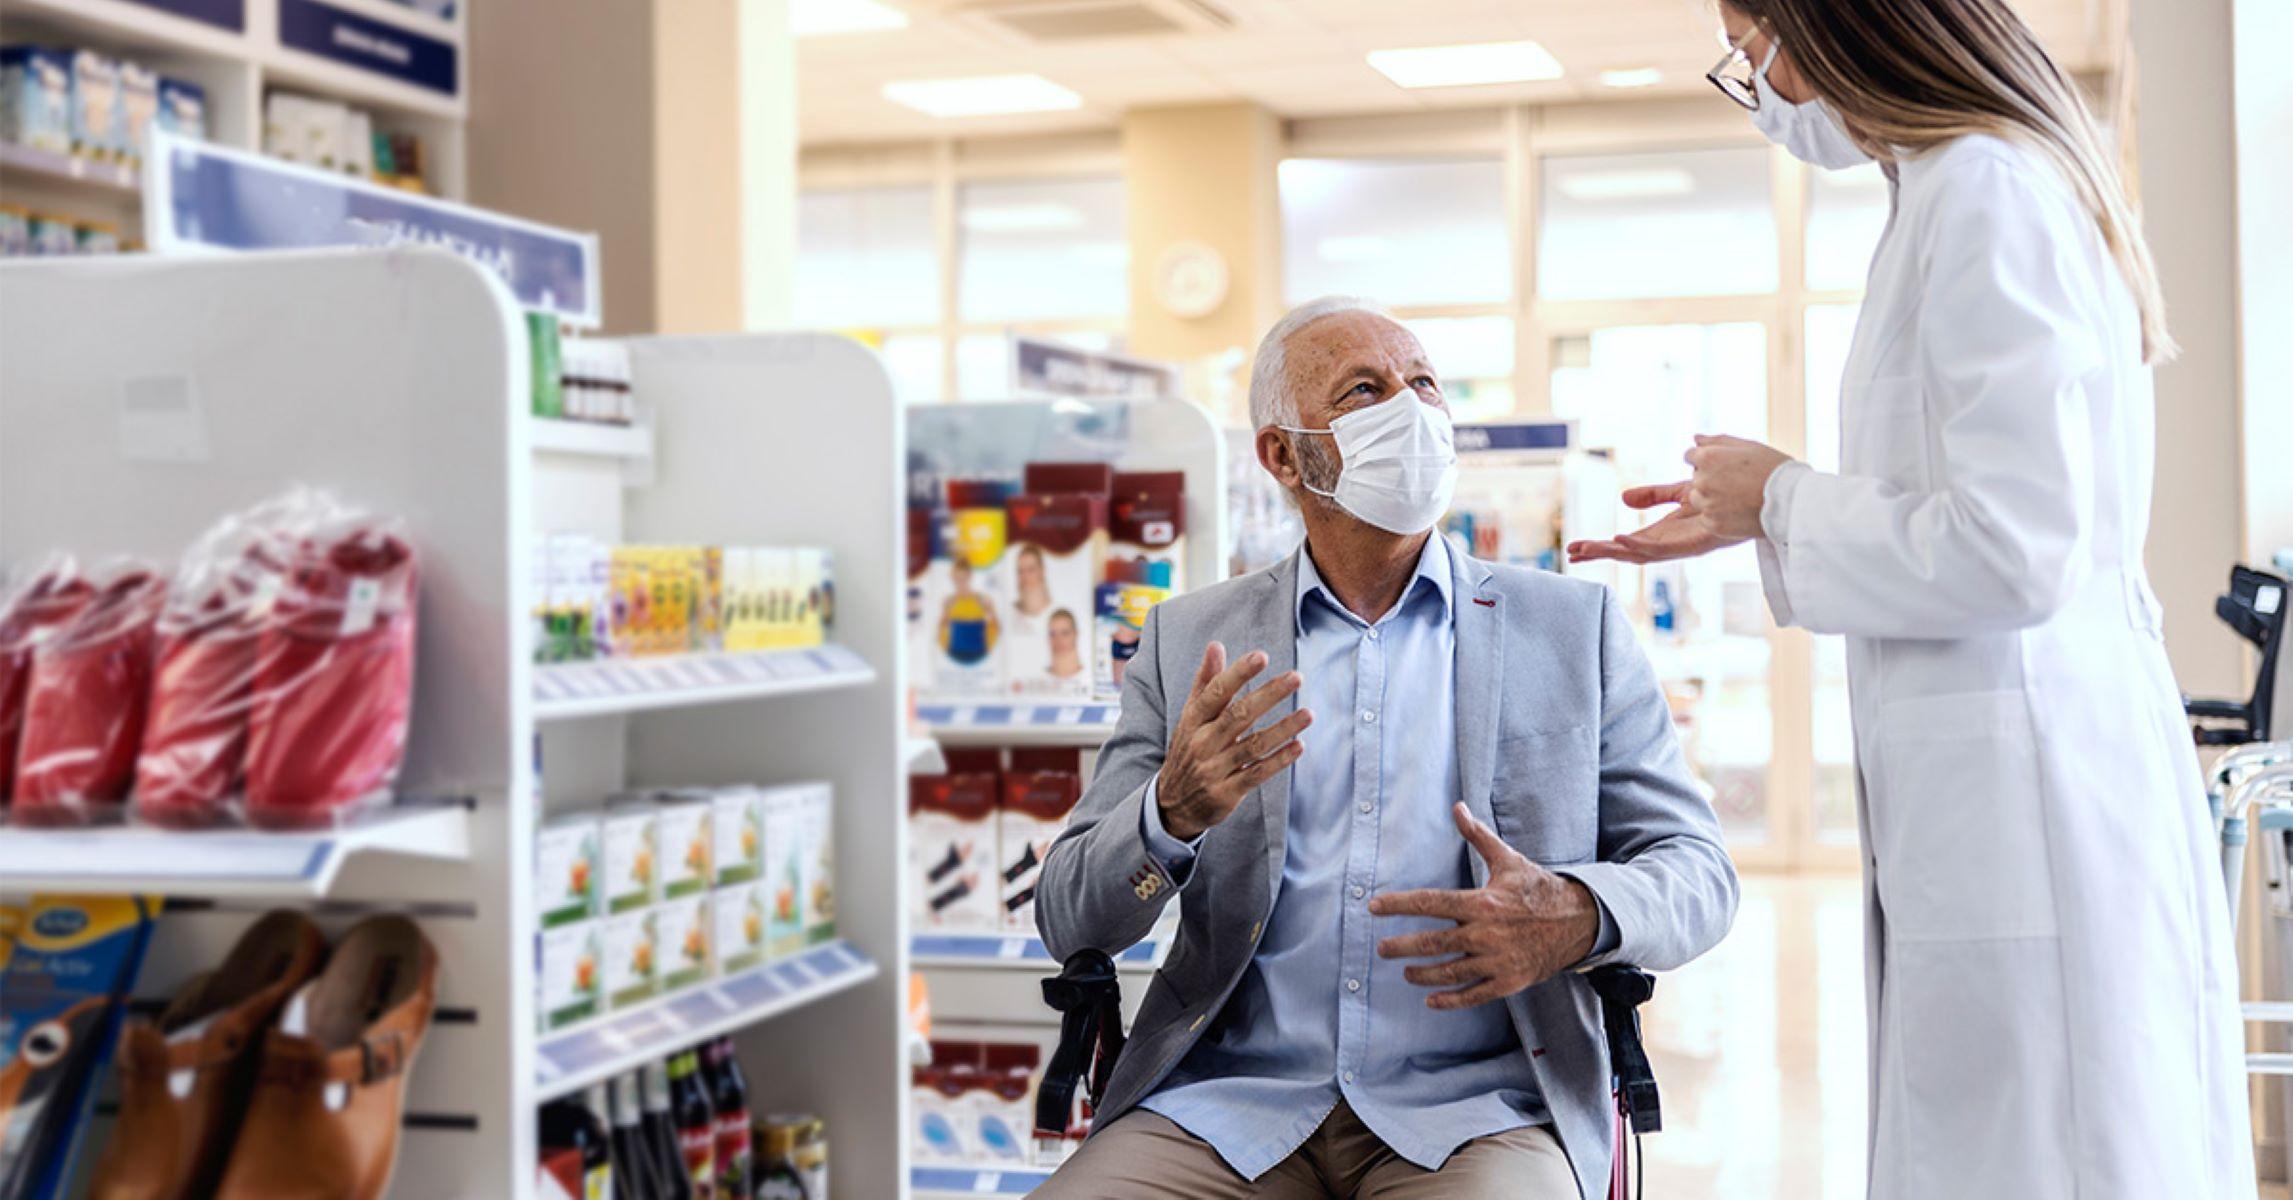 Rapid test φαρμακεία: Ξεκίνησαν να διενεργούν rapid test οι φαρμακοποιοί